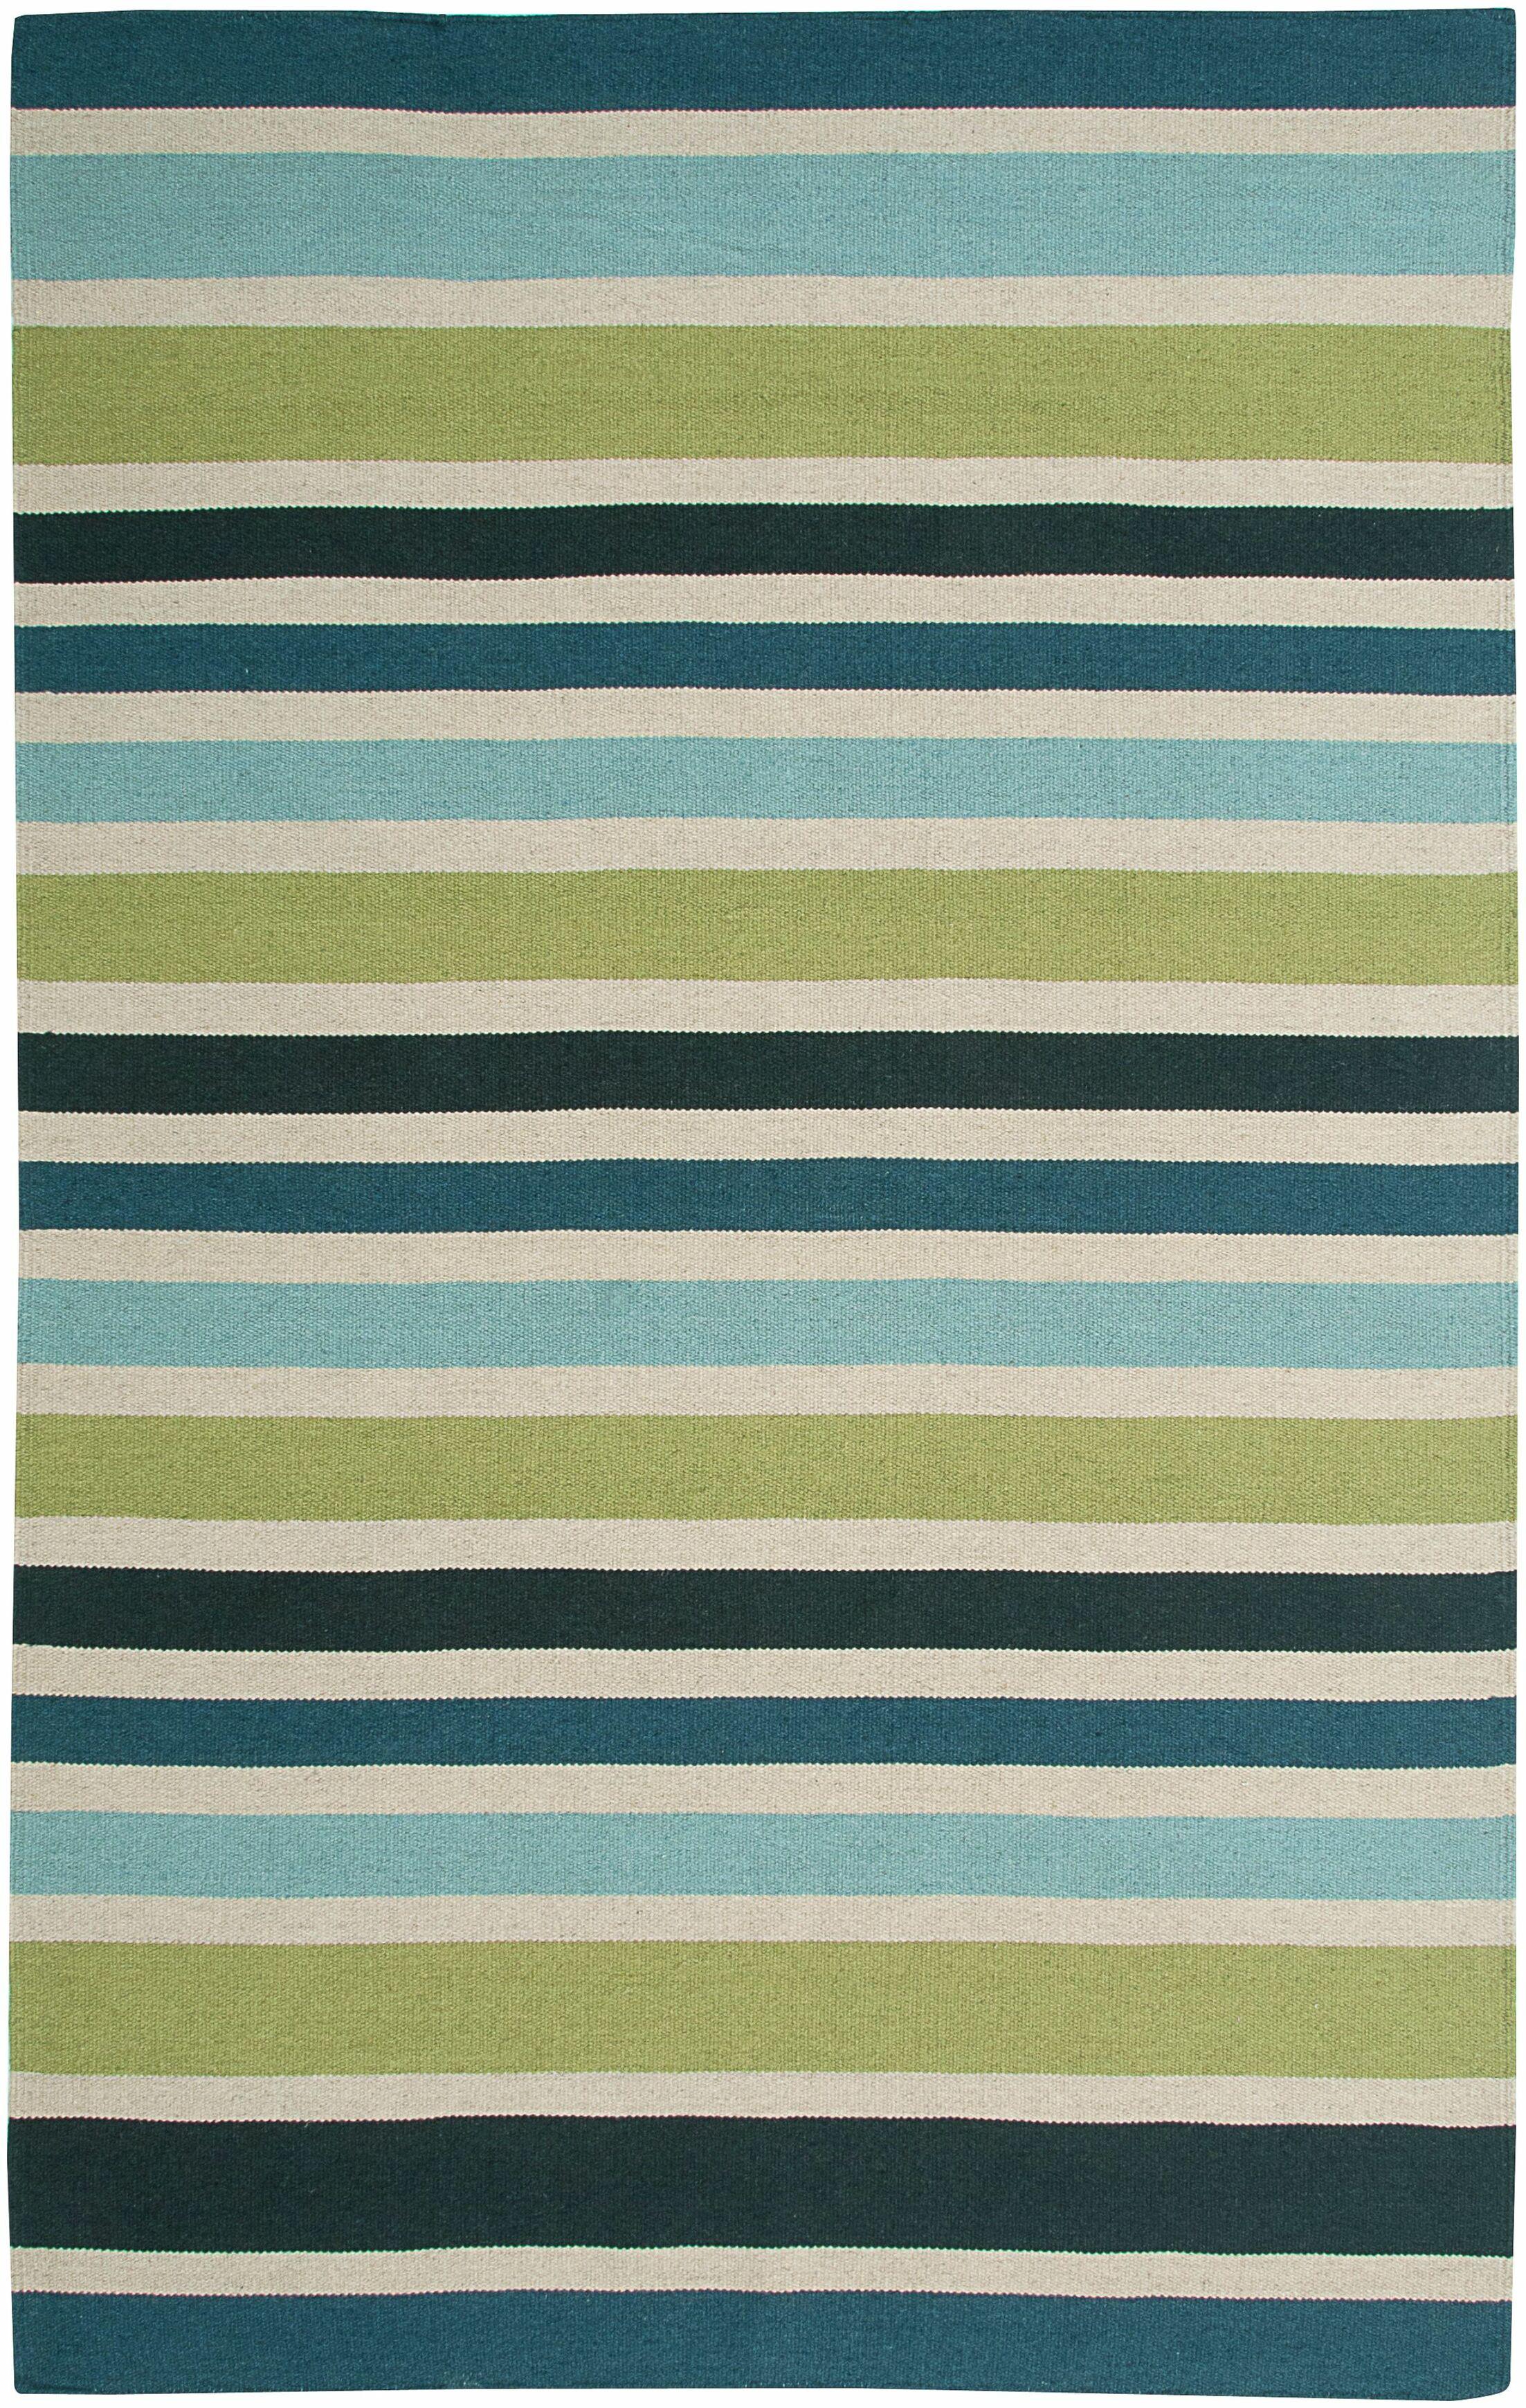 Hand-Woven Area Rug Rug Size: Rectangle 8' x 10'